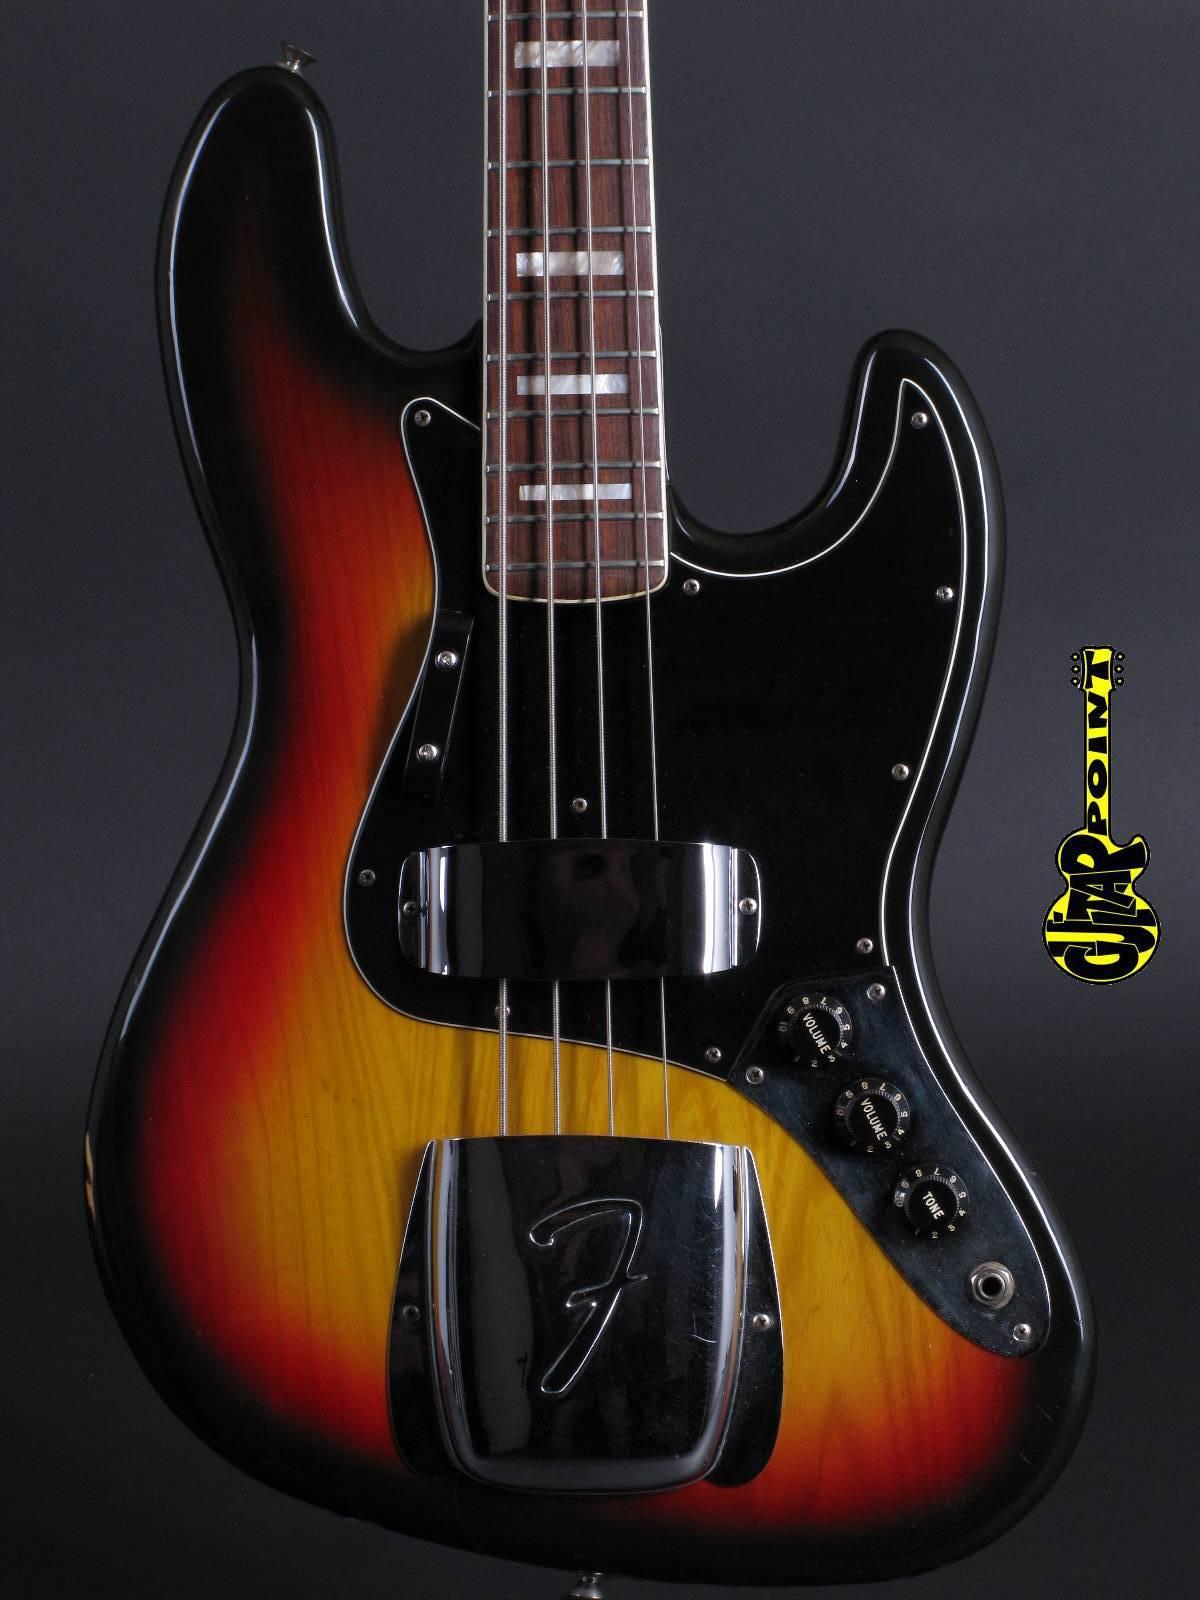 1978 Fender Jazz Bass 3-Tone Sunburst